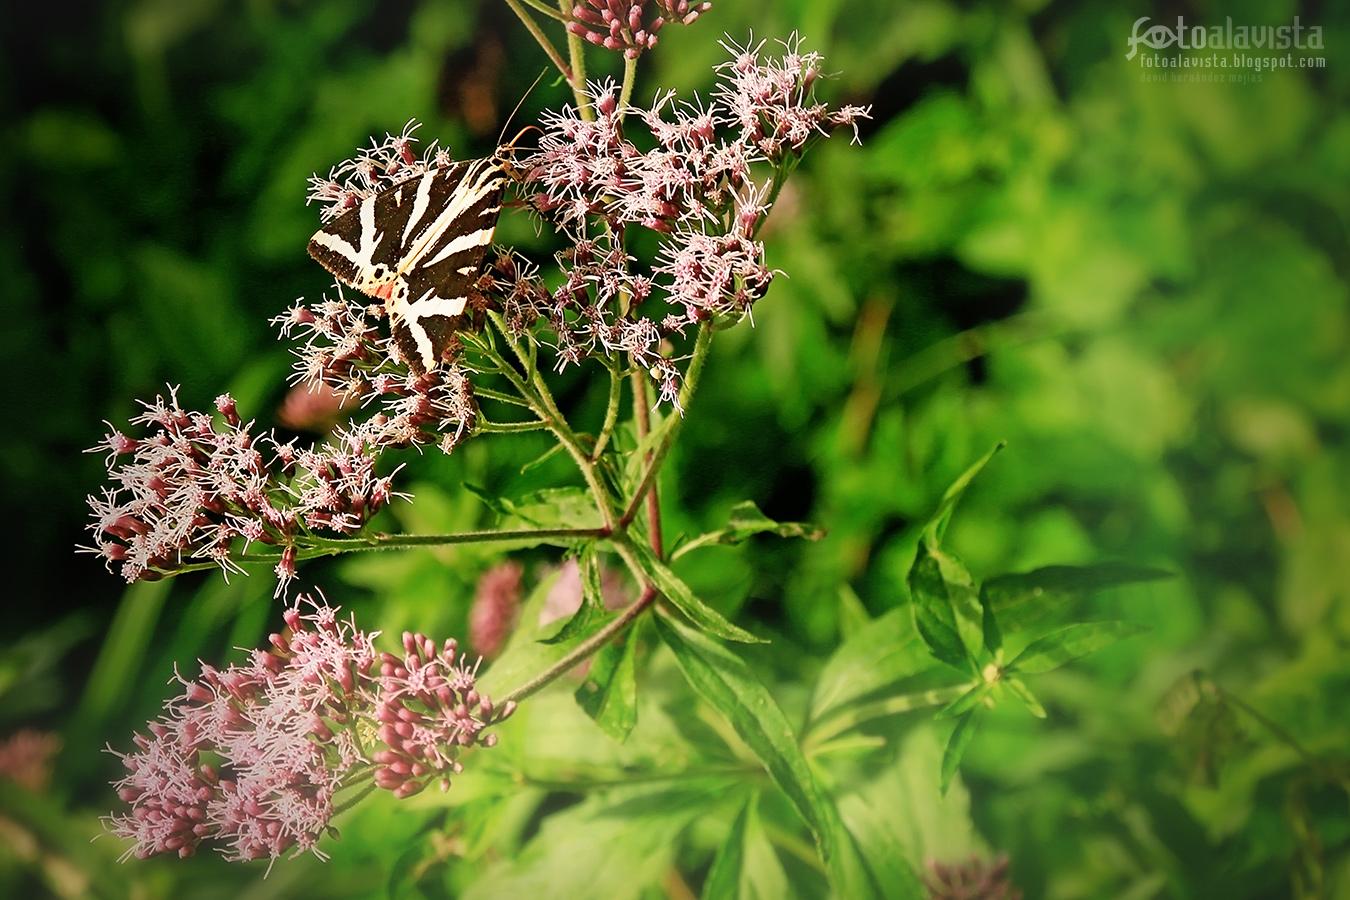 ¿Mariposa o cebra? - Fotografía